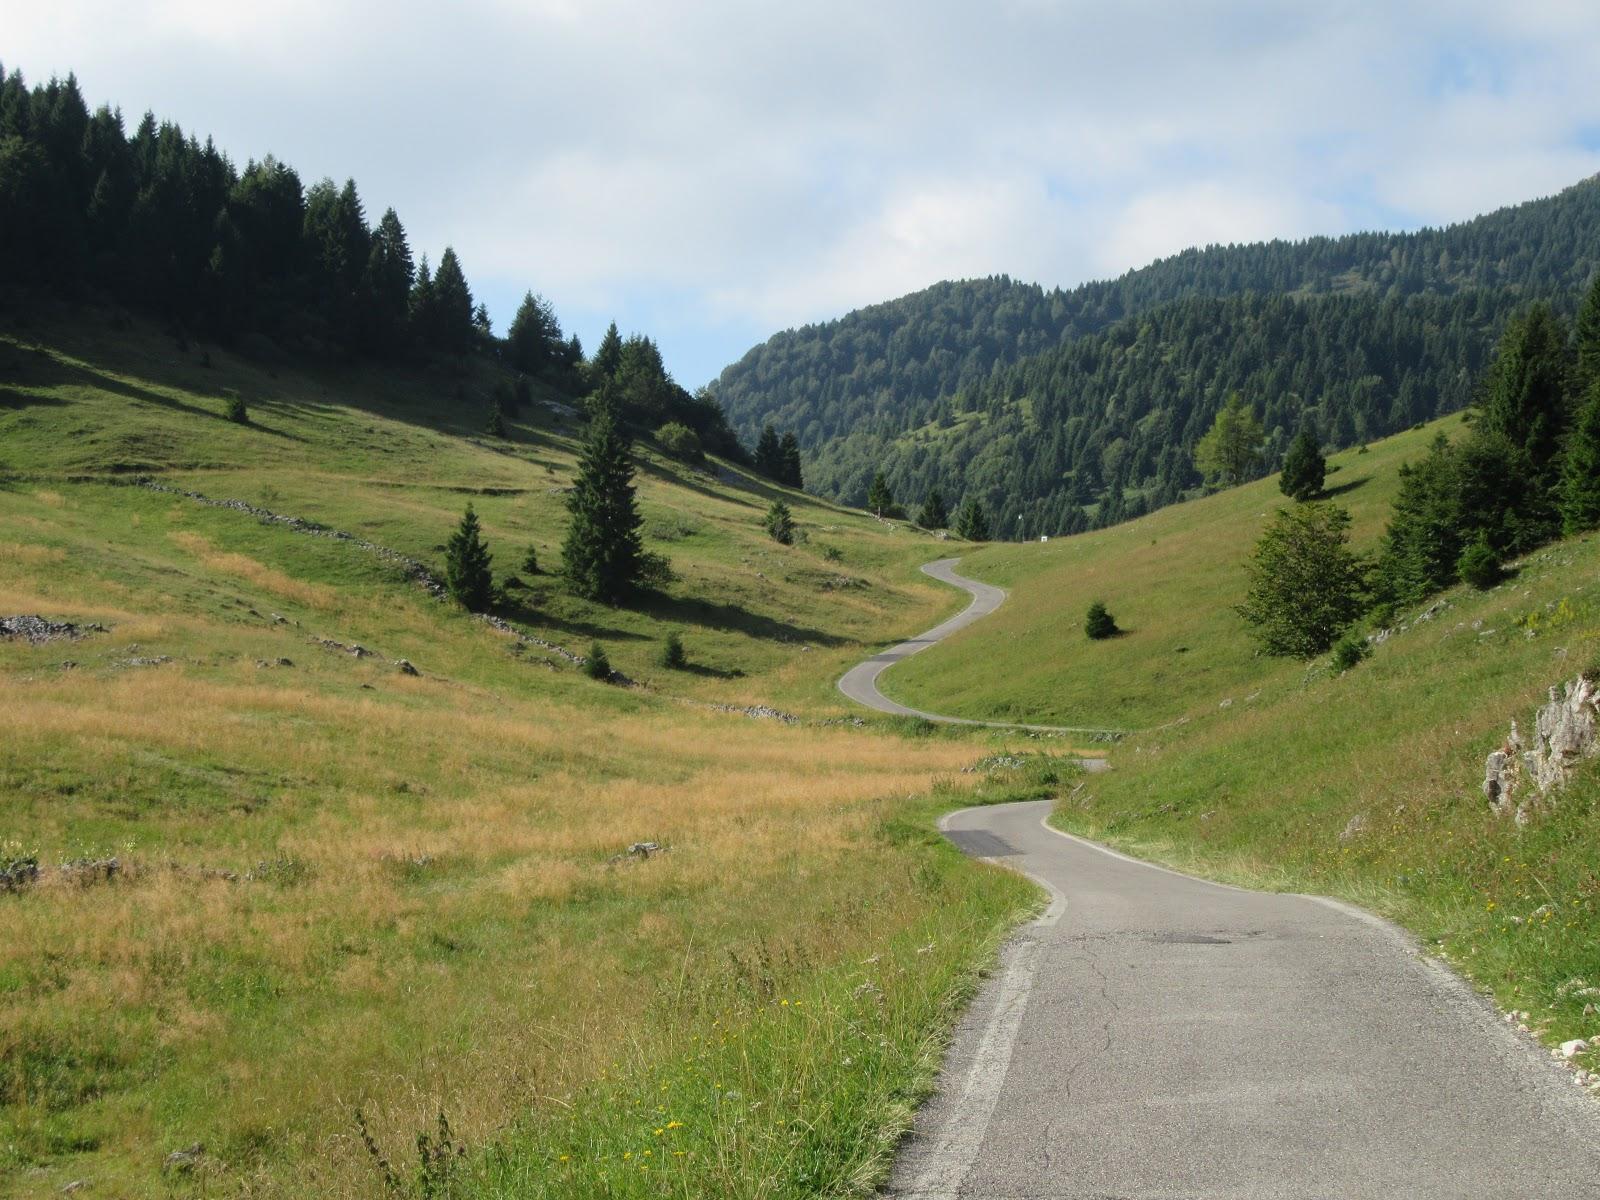 Climbing Monte Grappa - Cavaso del Tomba - roadway and meadow